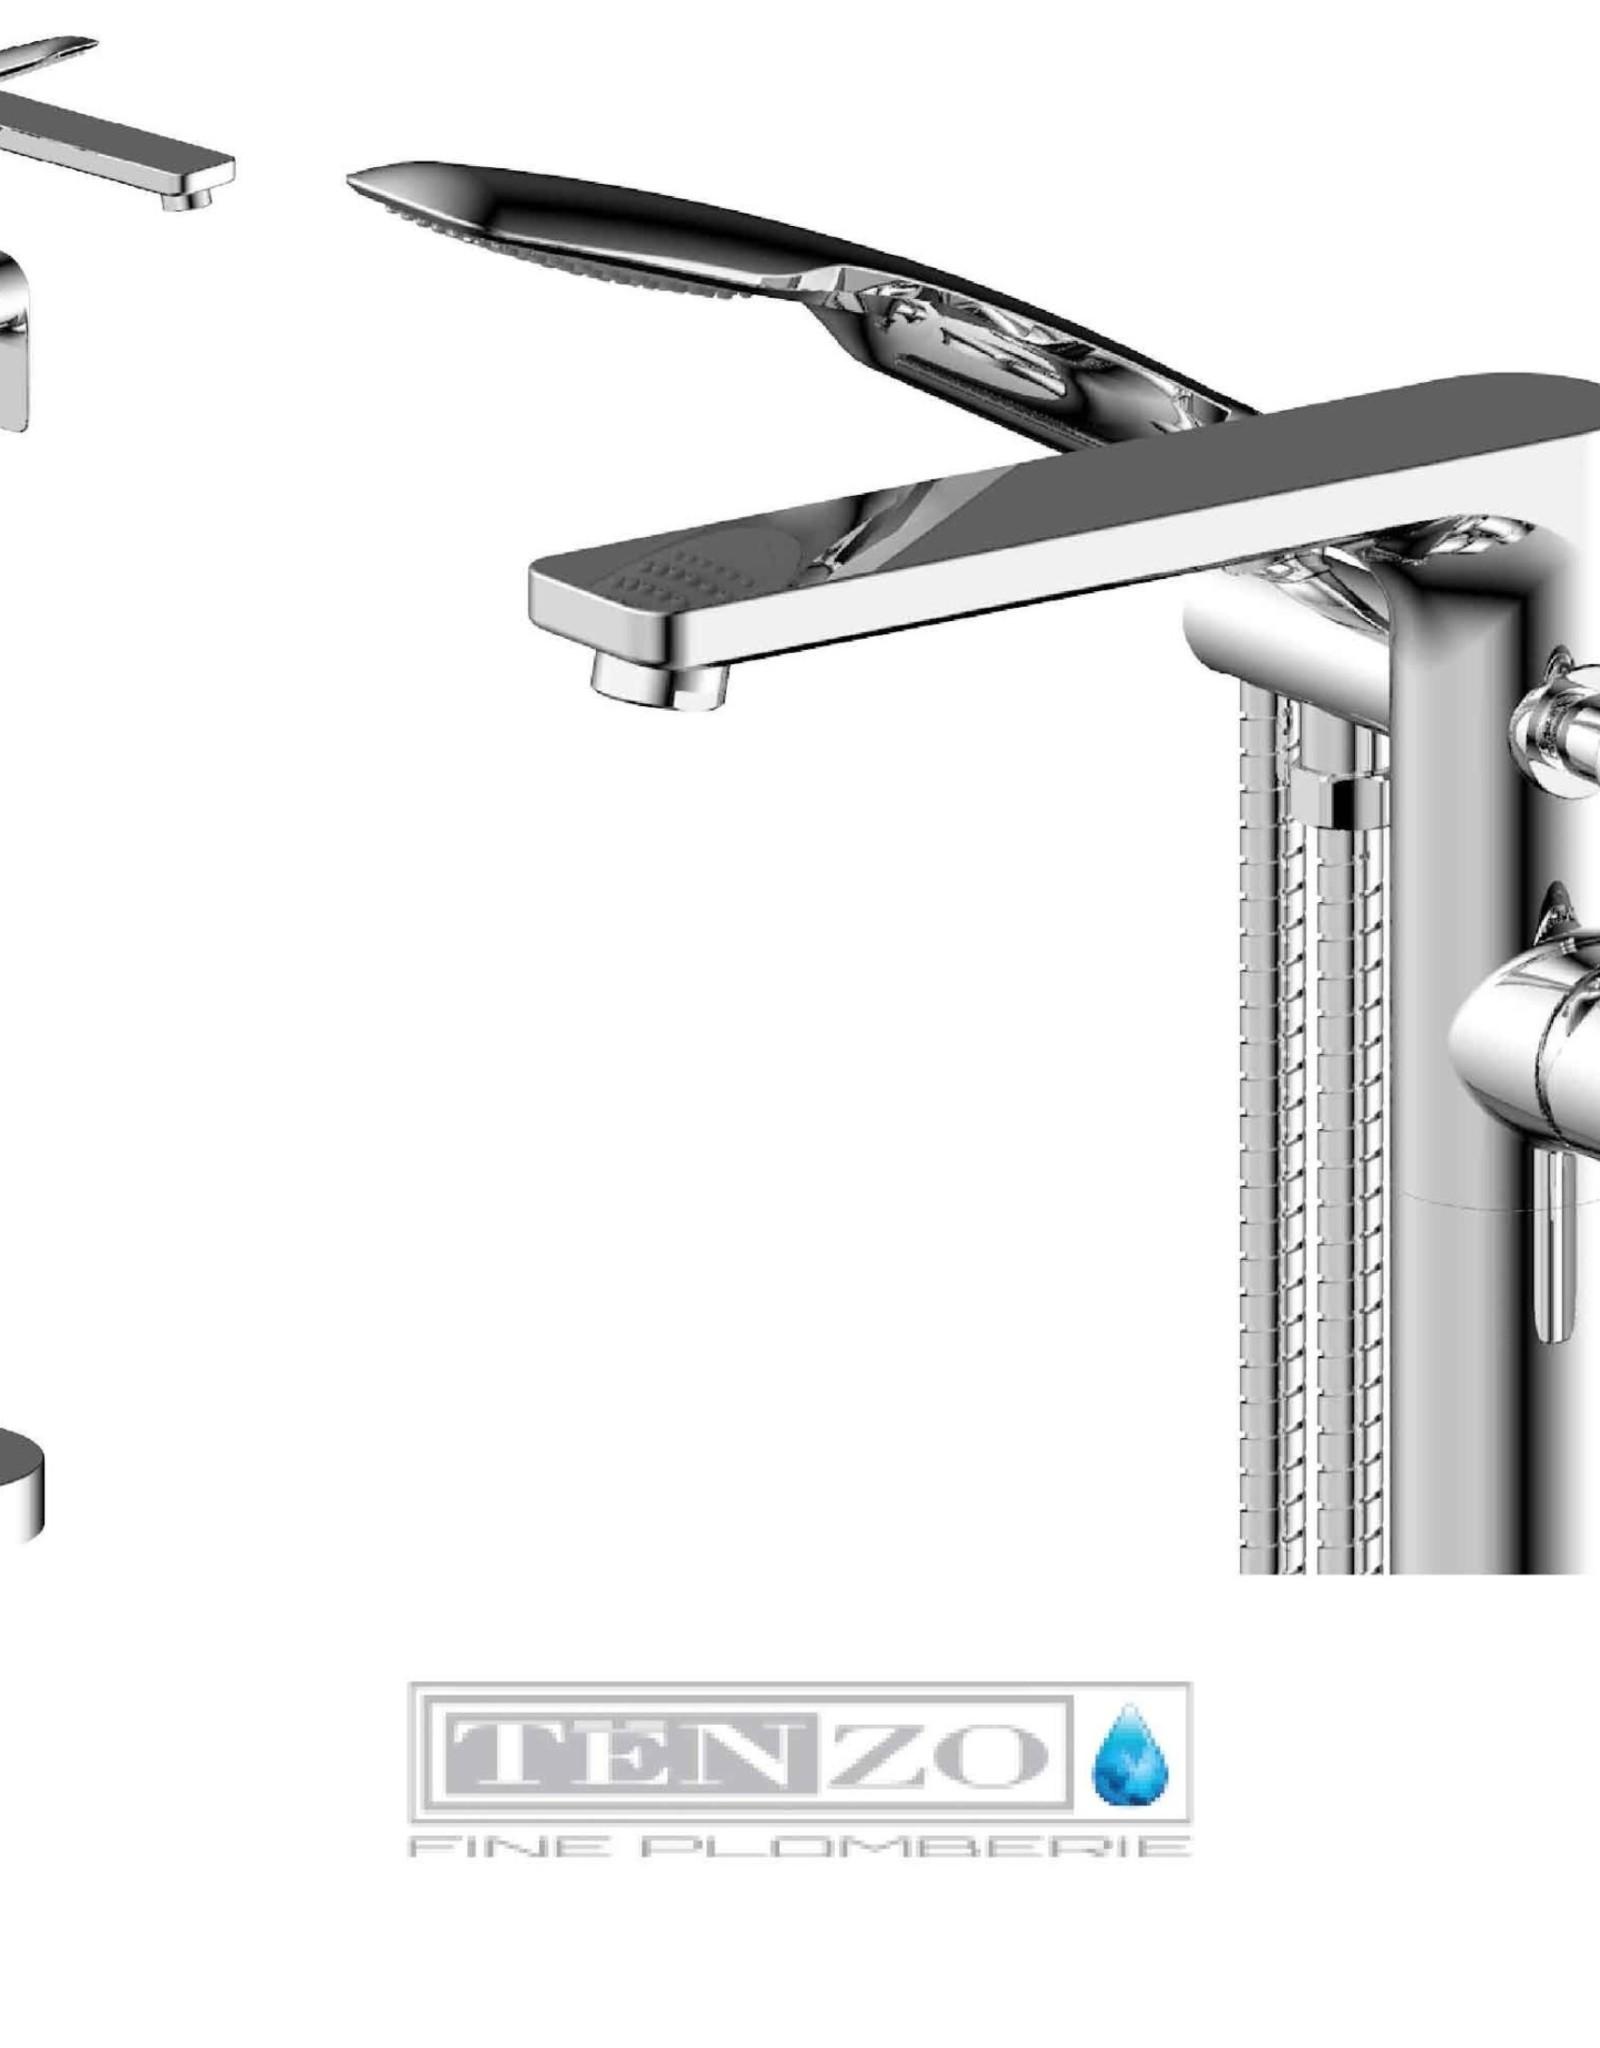 Tenzo Tenzo Delano Freestanding Tub Filler